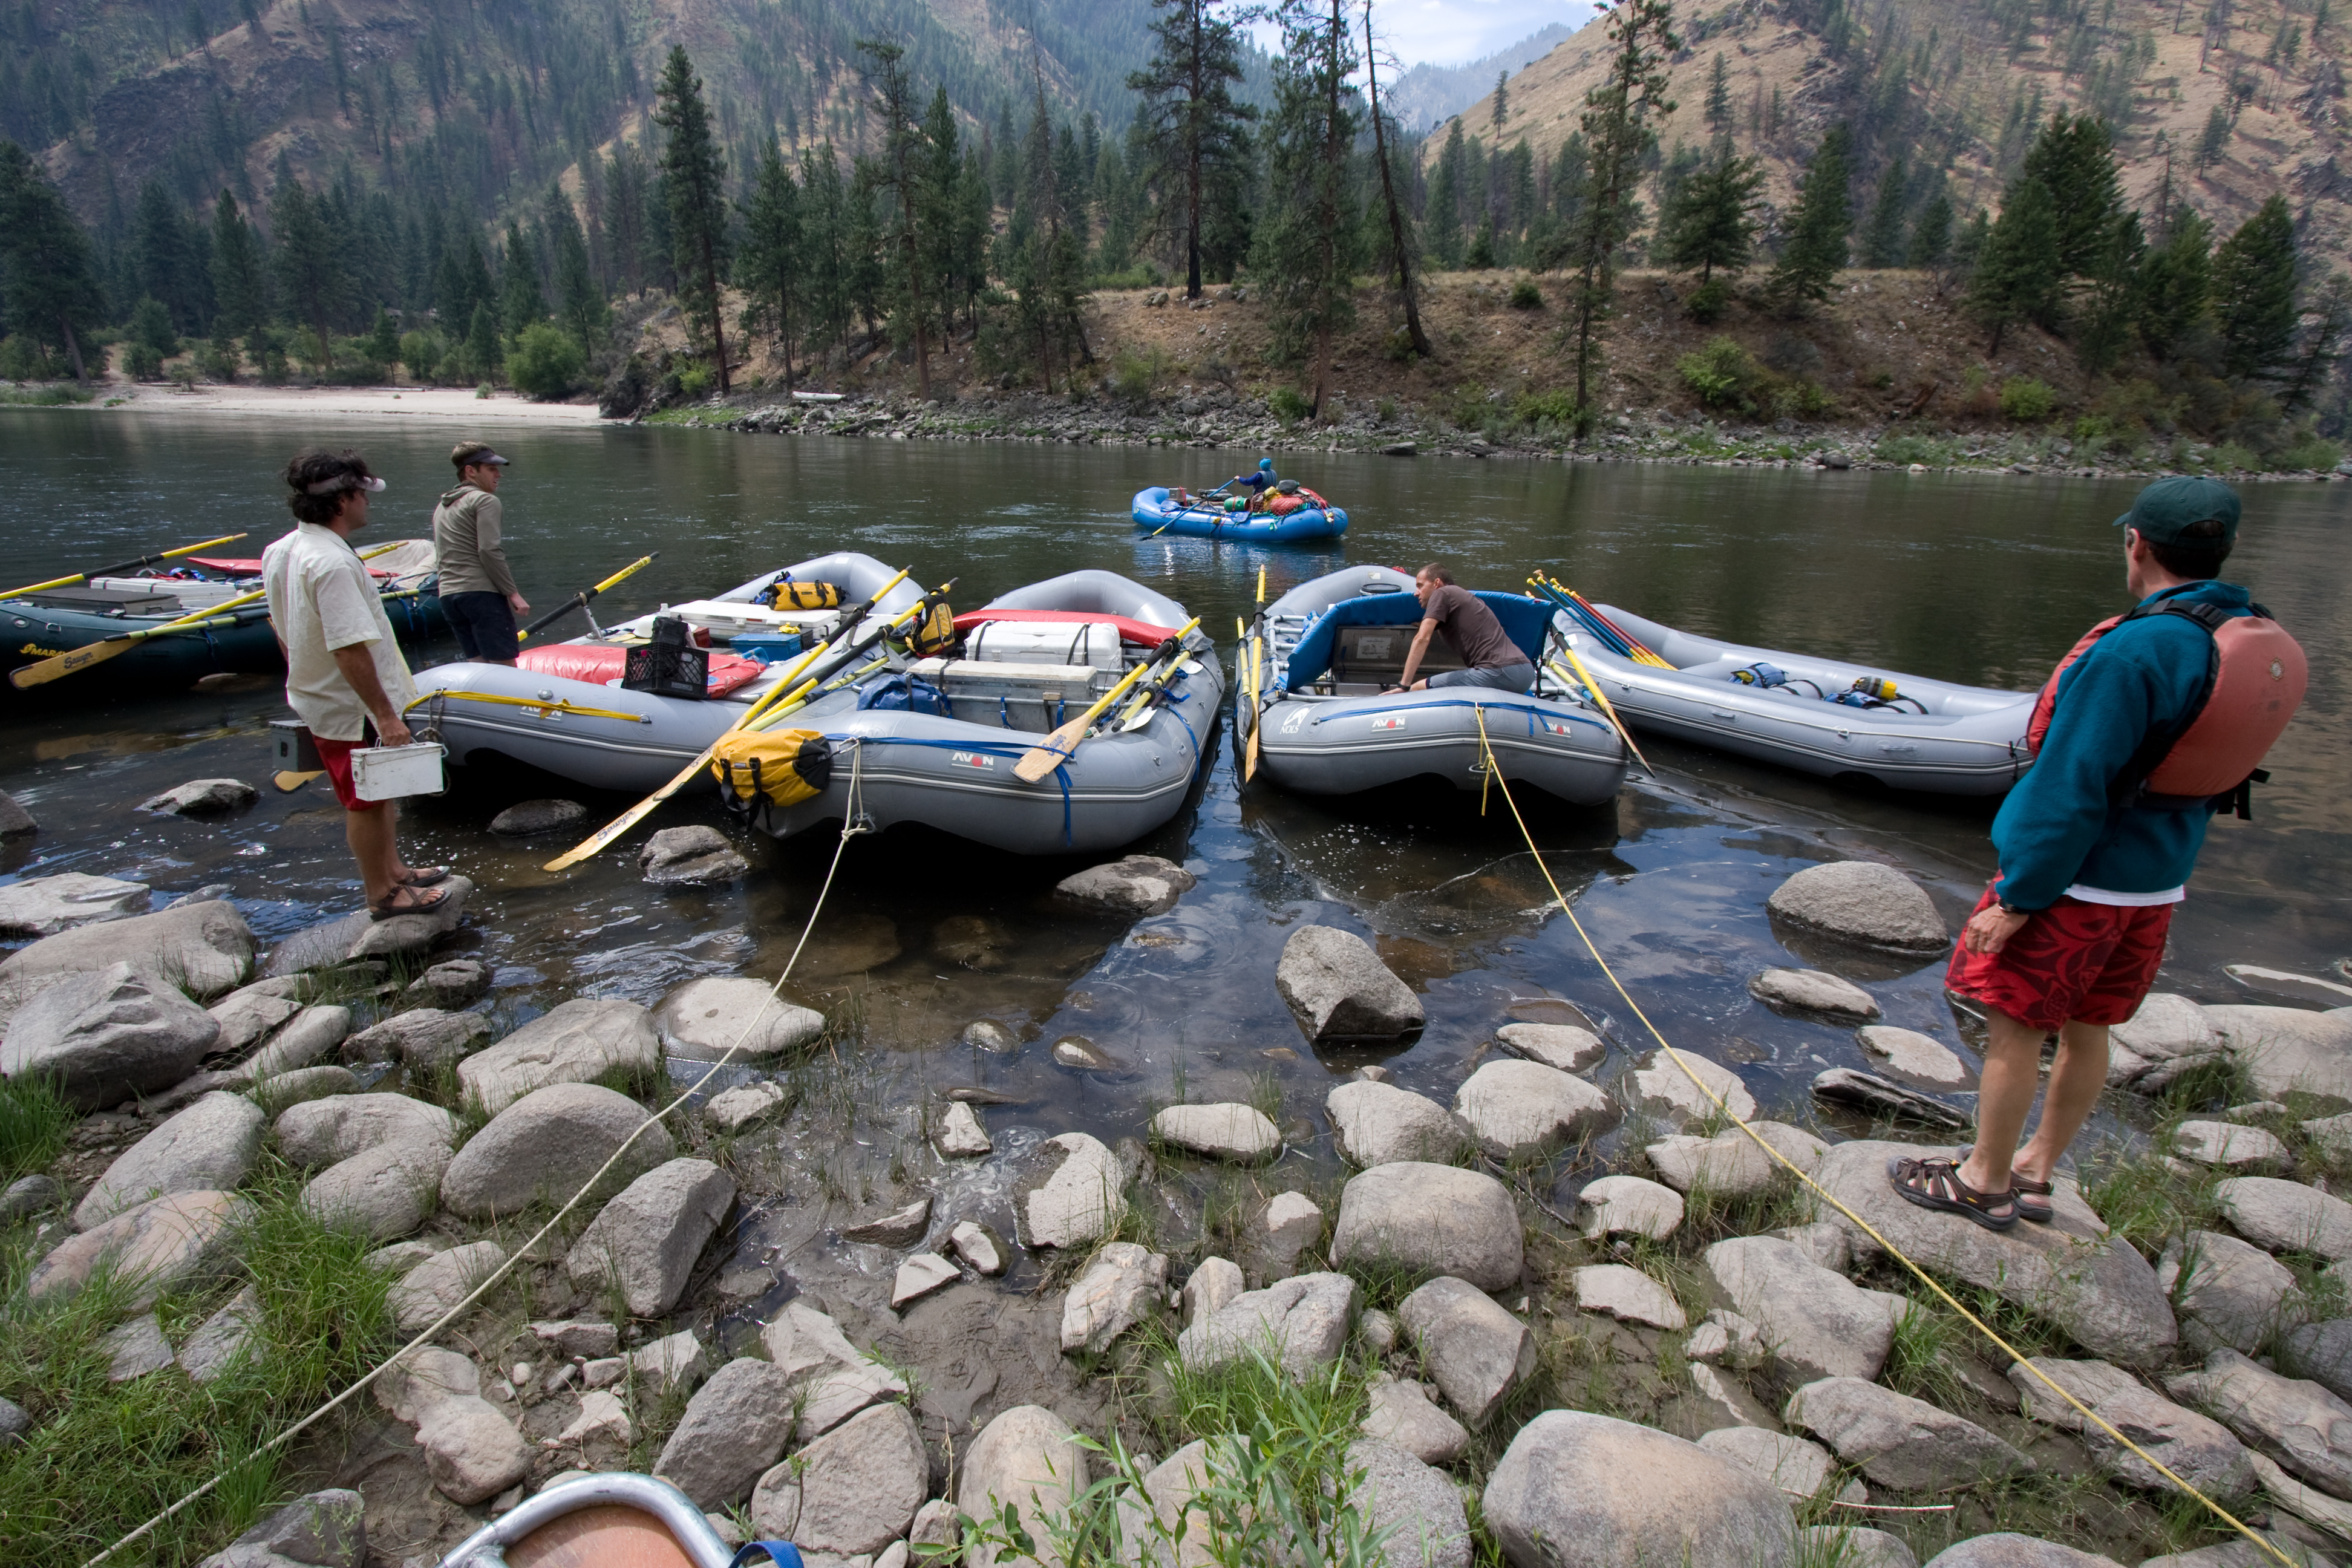 Summer Program - Whitewater Rafting | NOLS Salmon River Adventure